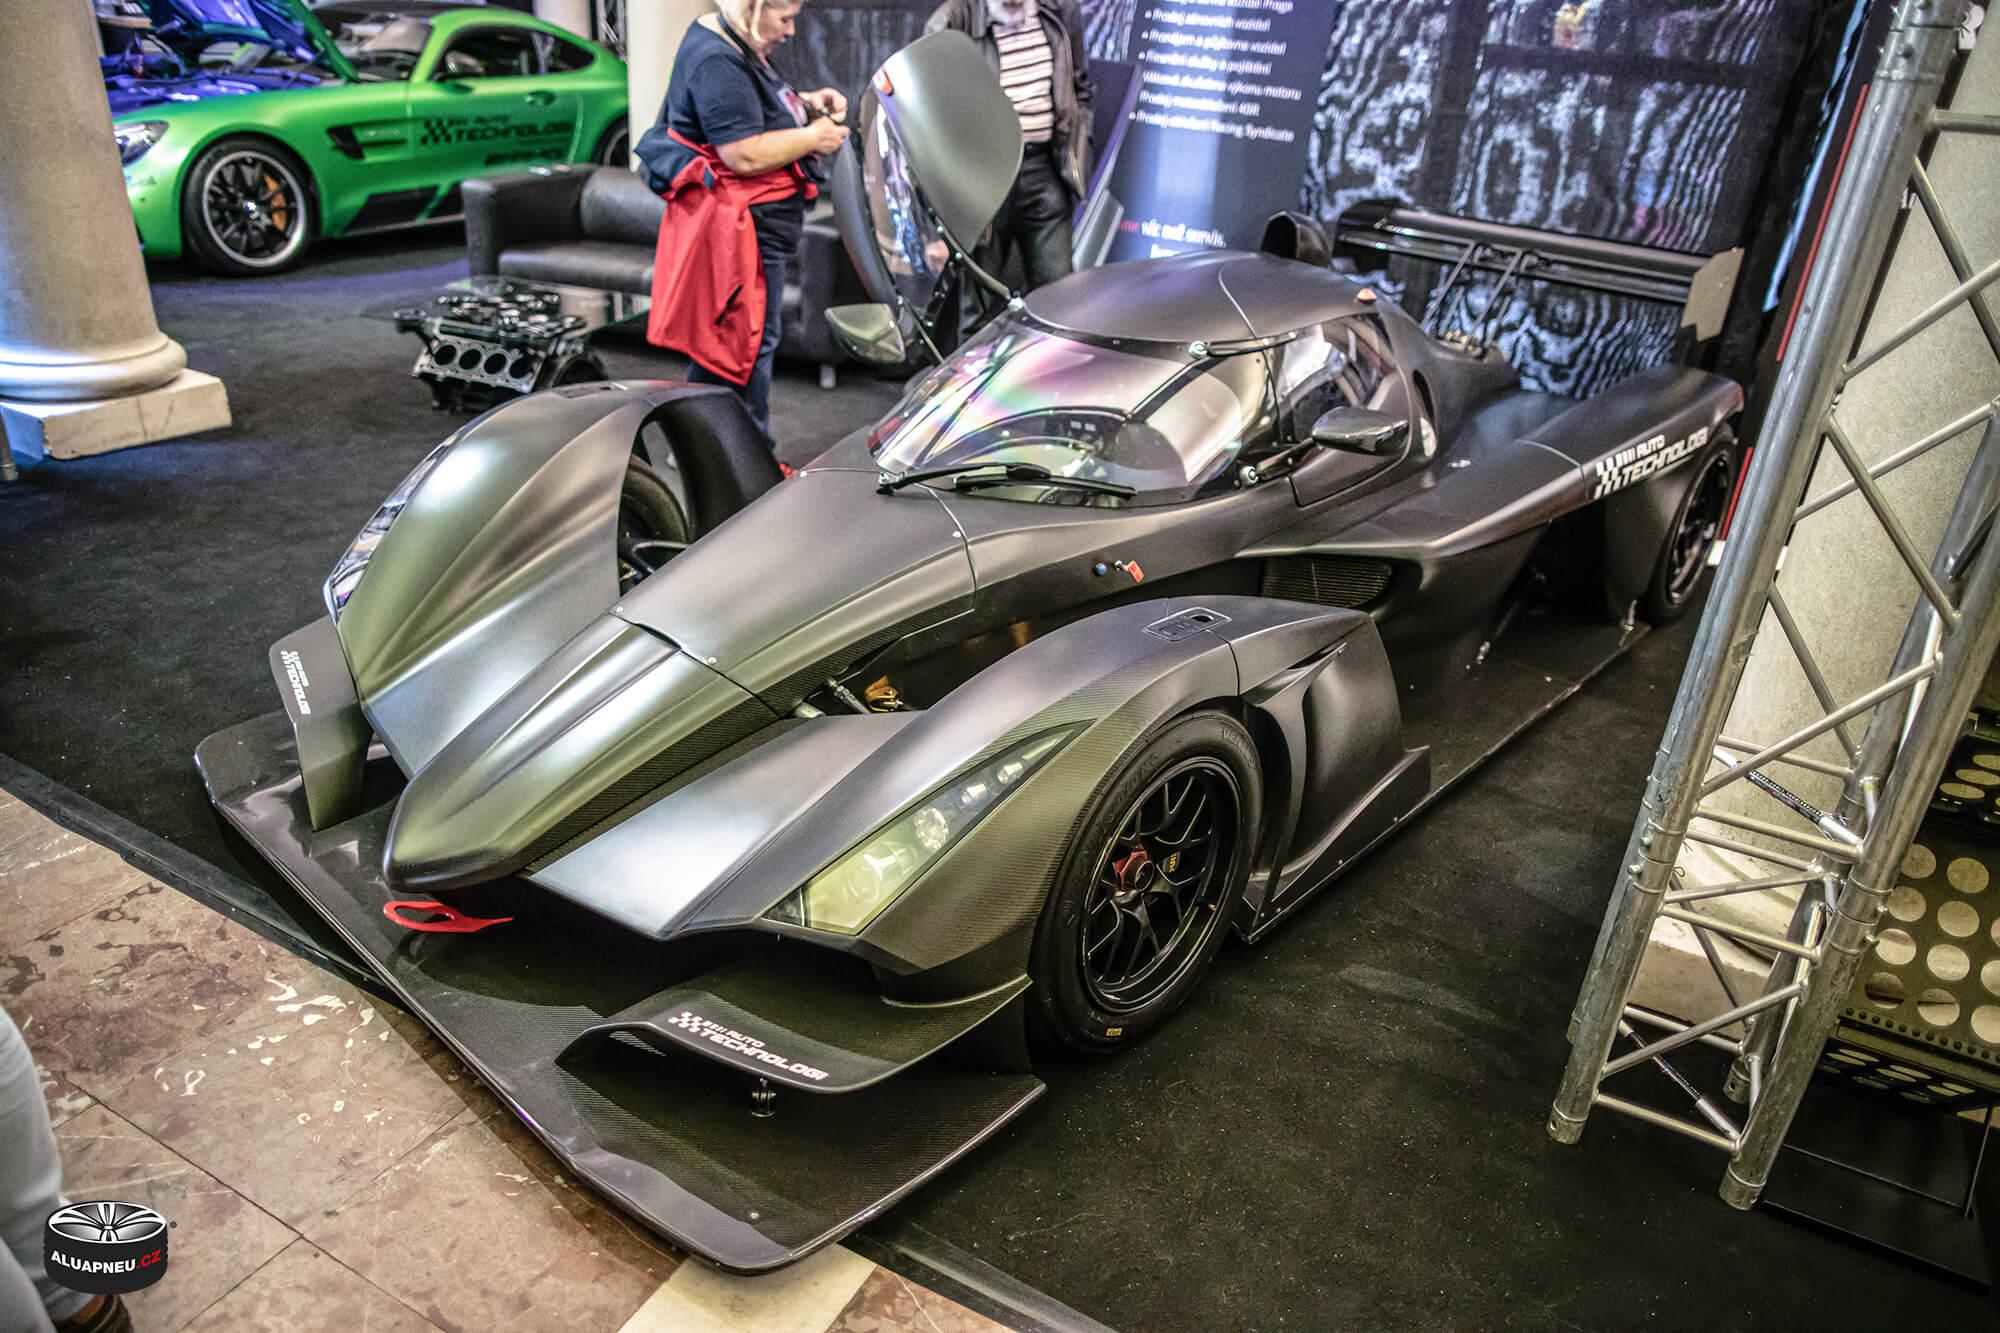 Racing - Automobilové Legendy 2019 - www.aluapneu.cz